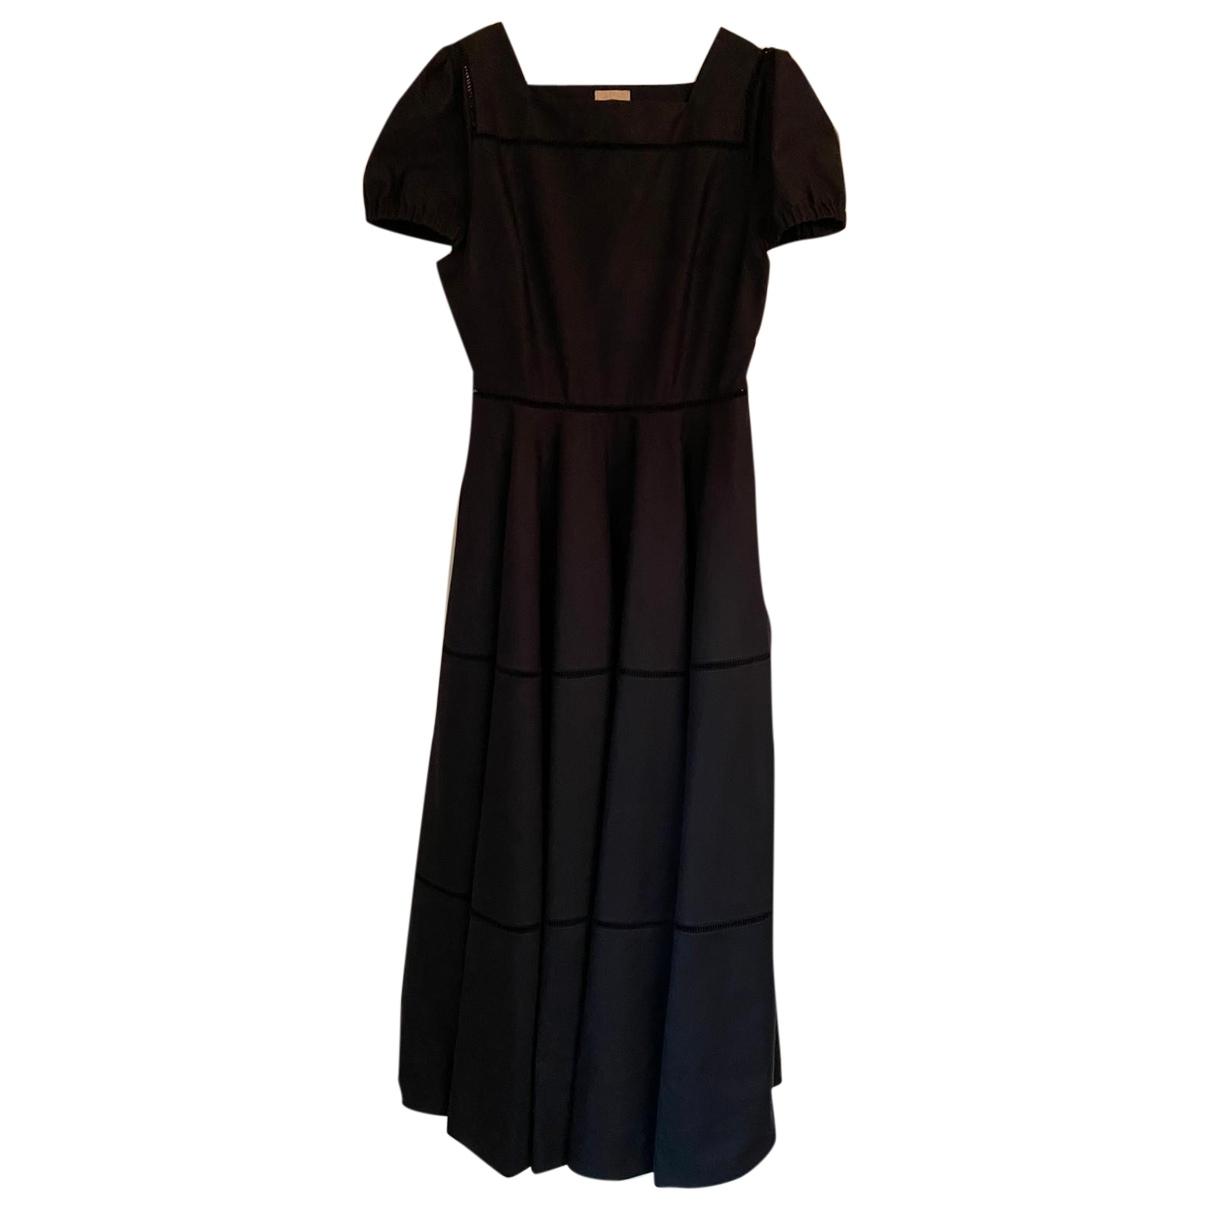 Alaïa \N Black Cotton dress for Women 42 IT